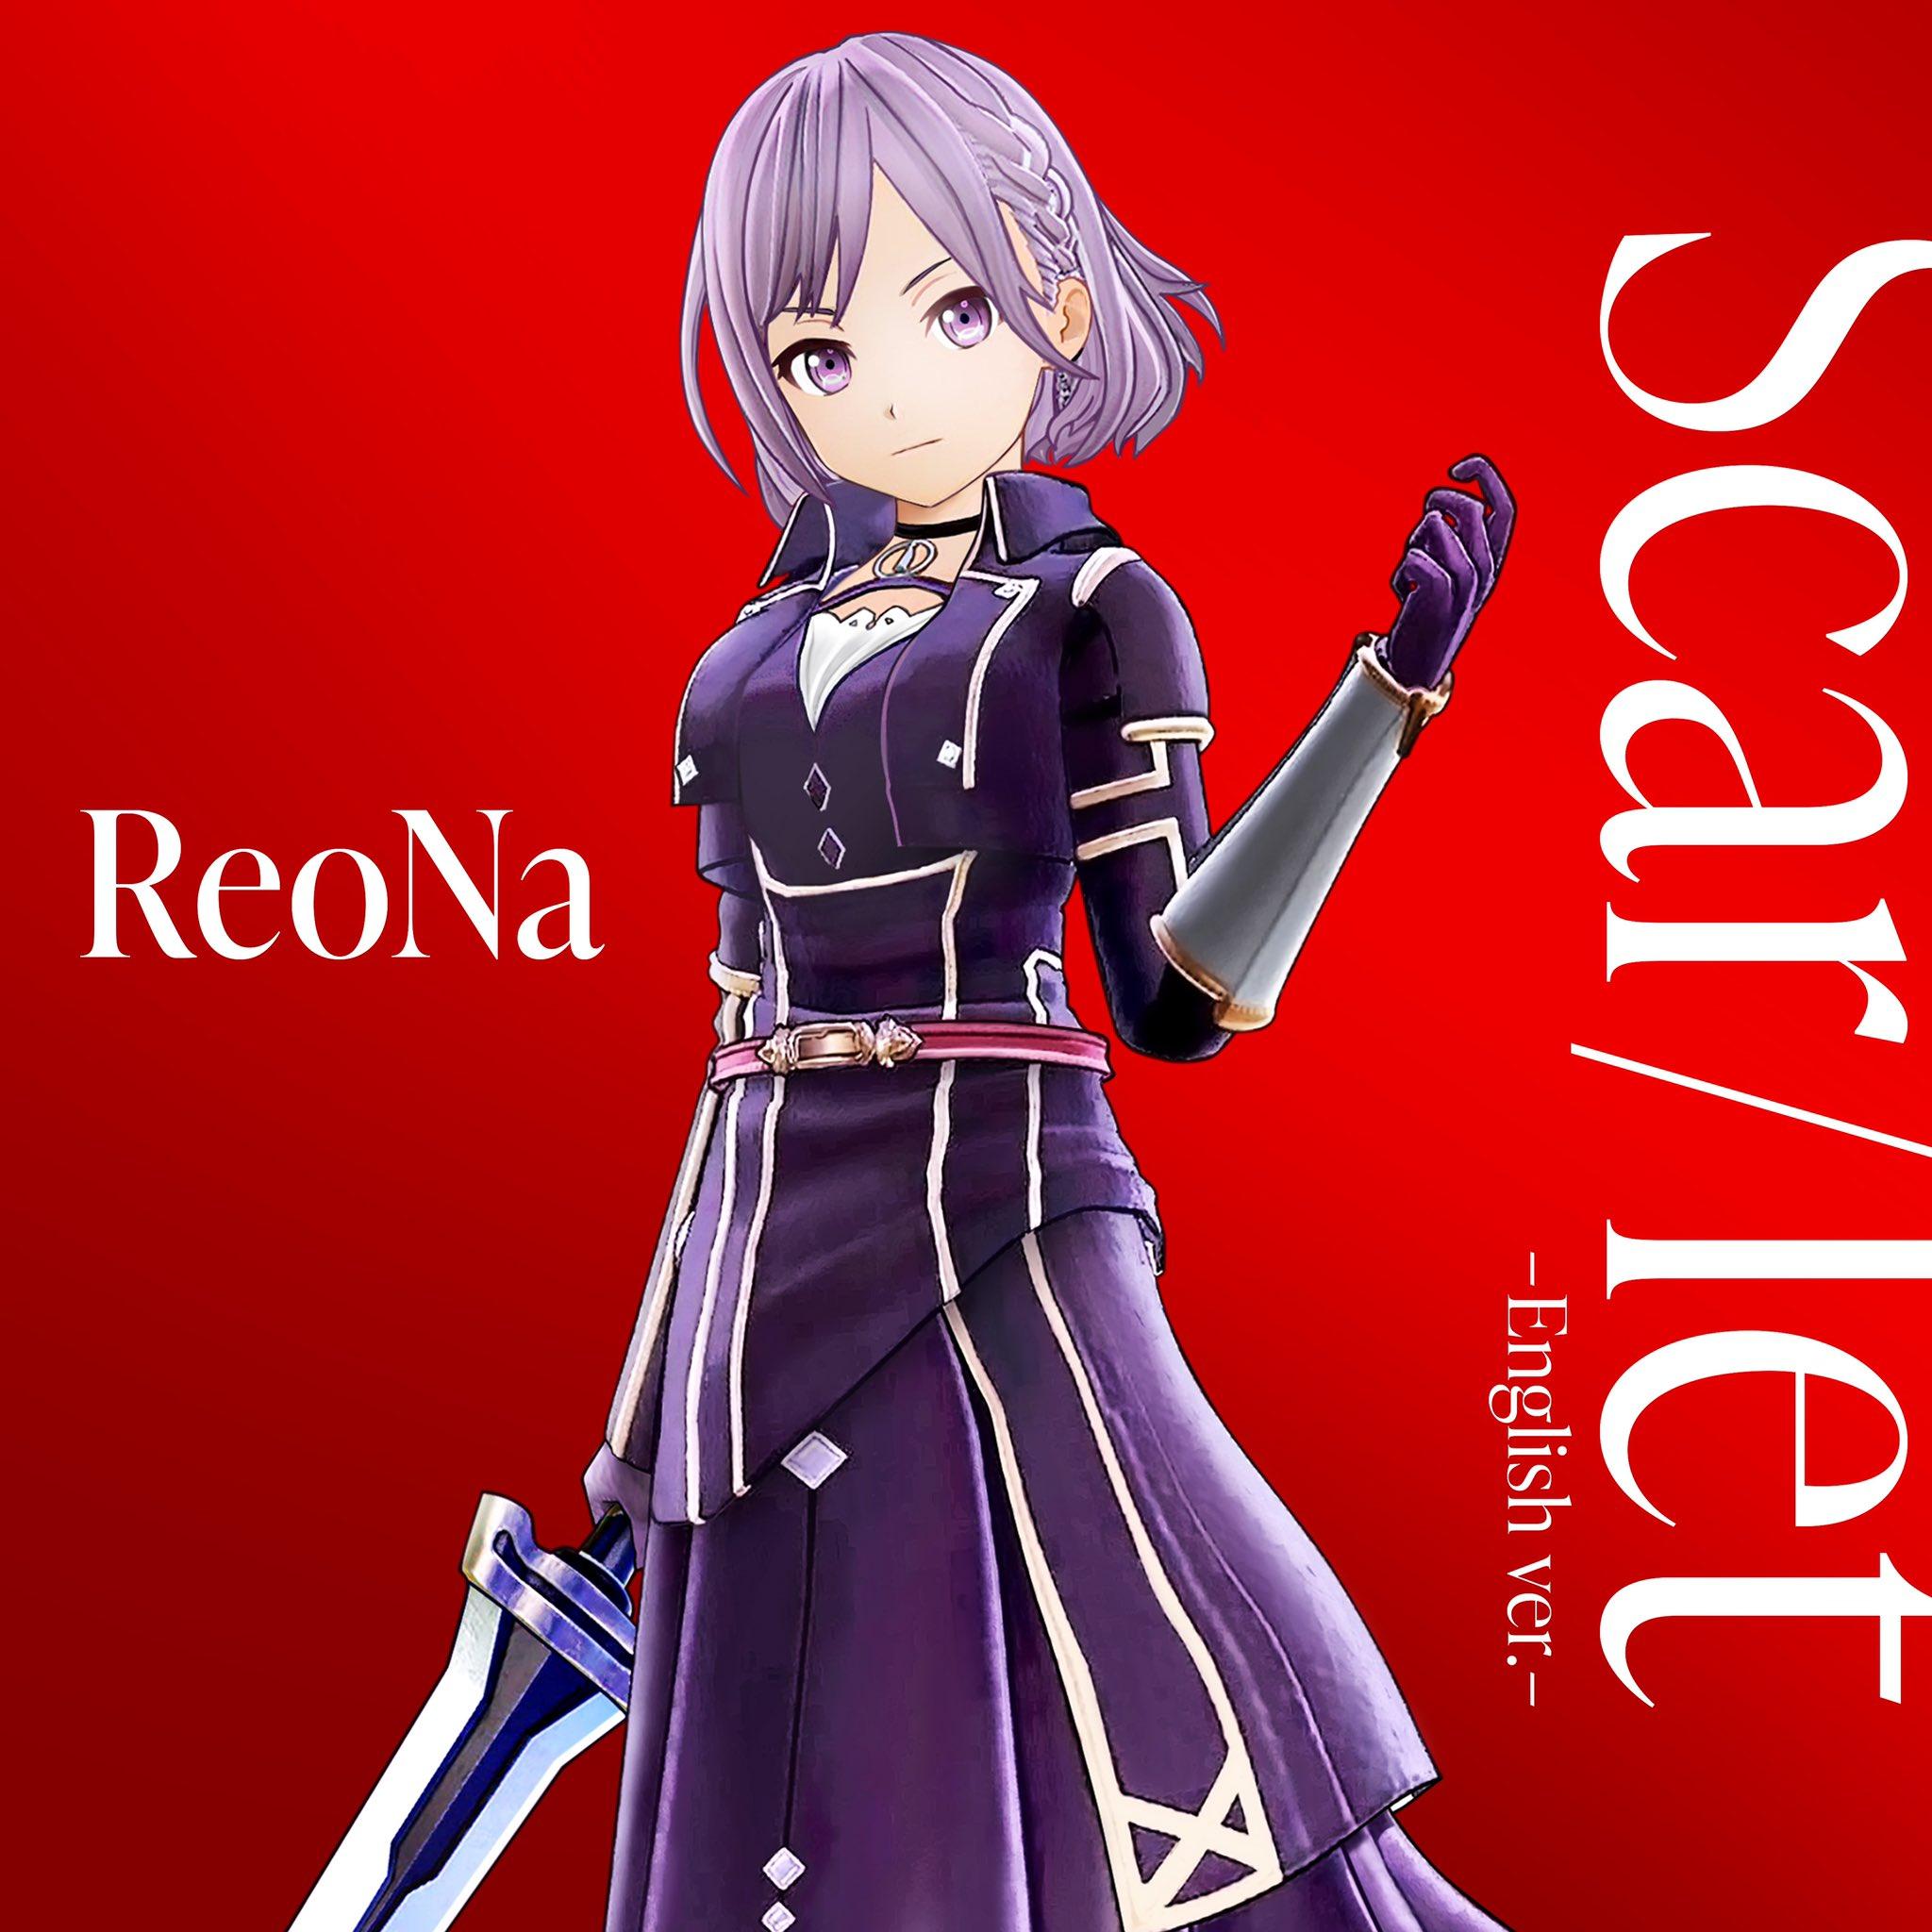 ReoNa - Scar/let Lyrics